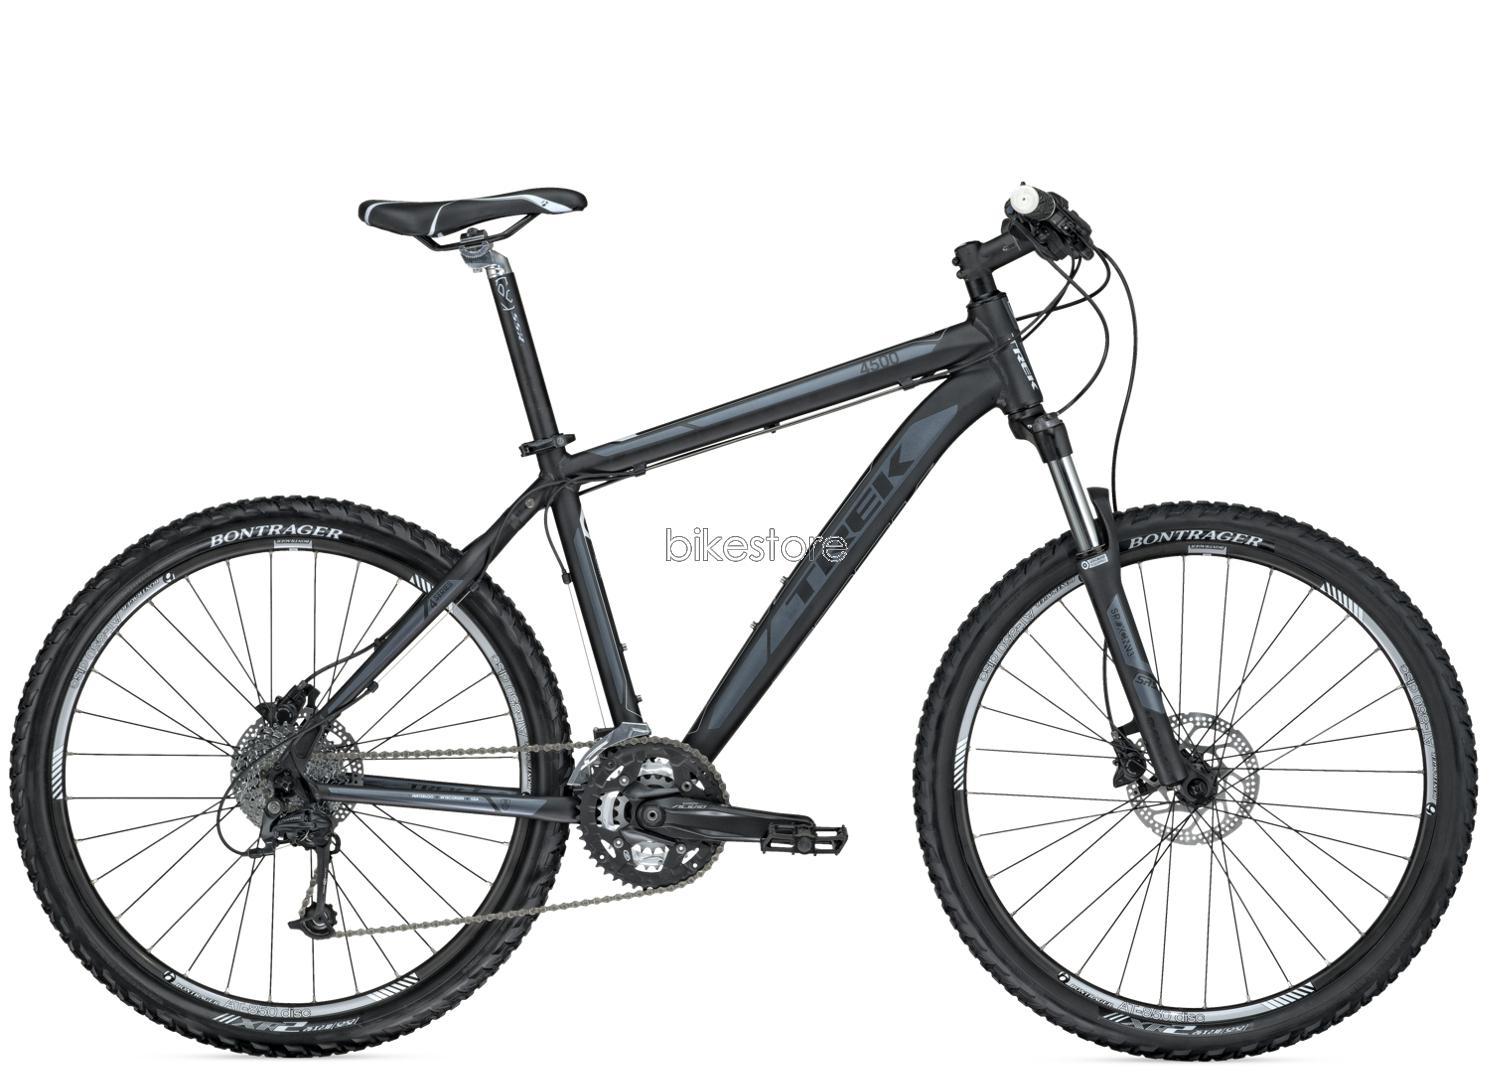 noti bici  bicicleta mtb trek 4 series 4500 disc 2012